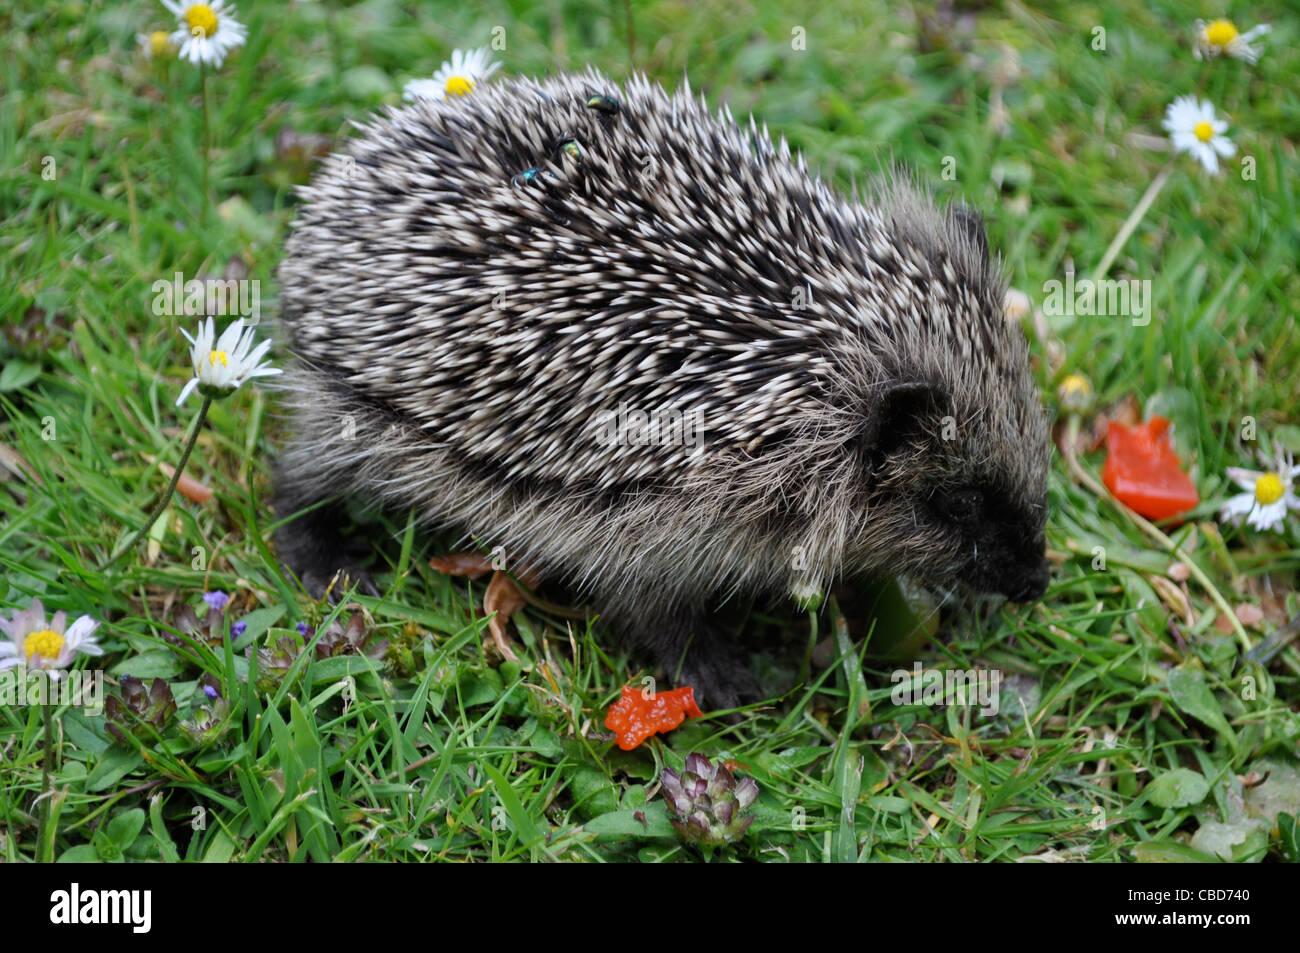 hedgehogs baby stockfotos hedgehogs baby bilder alamy. Black Bedroom Furniture Sets. Home Design Ideas